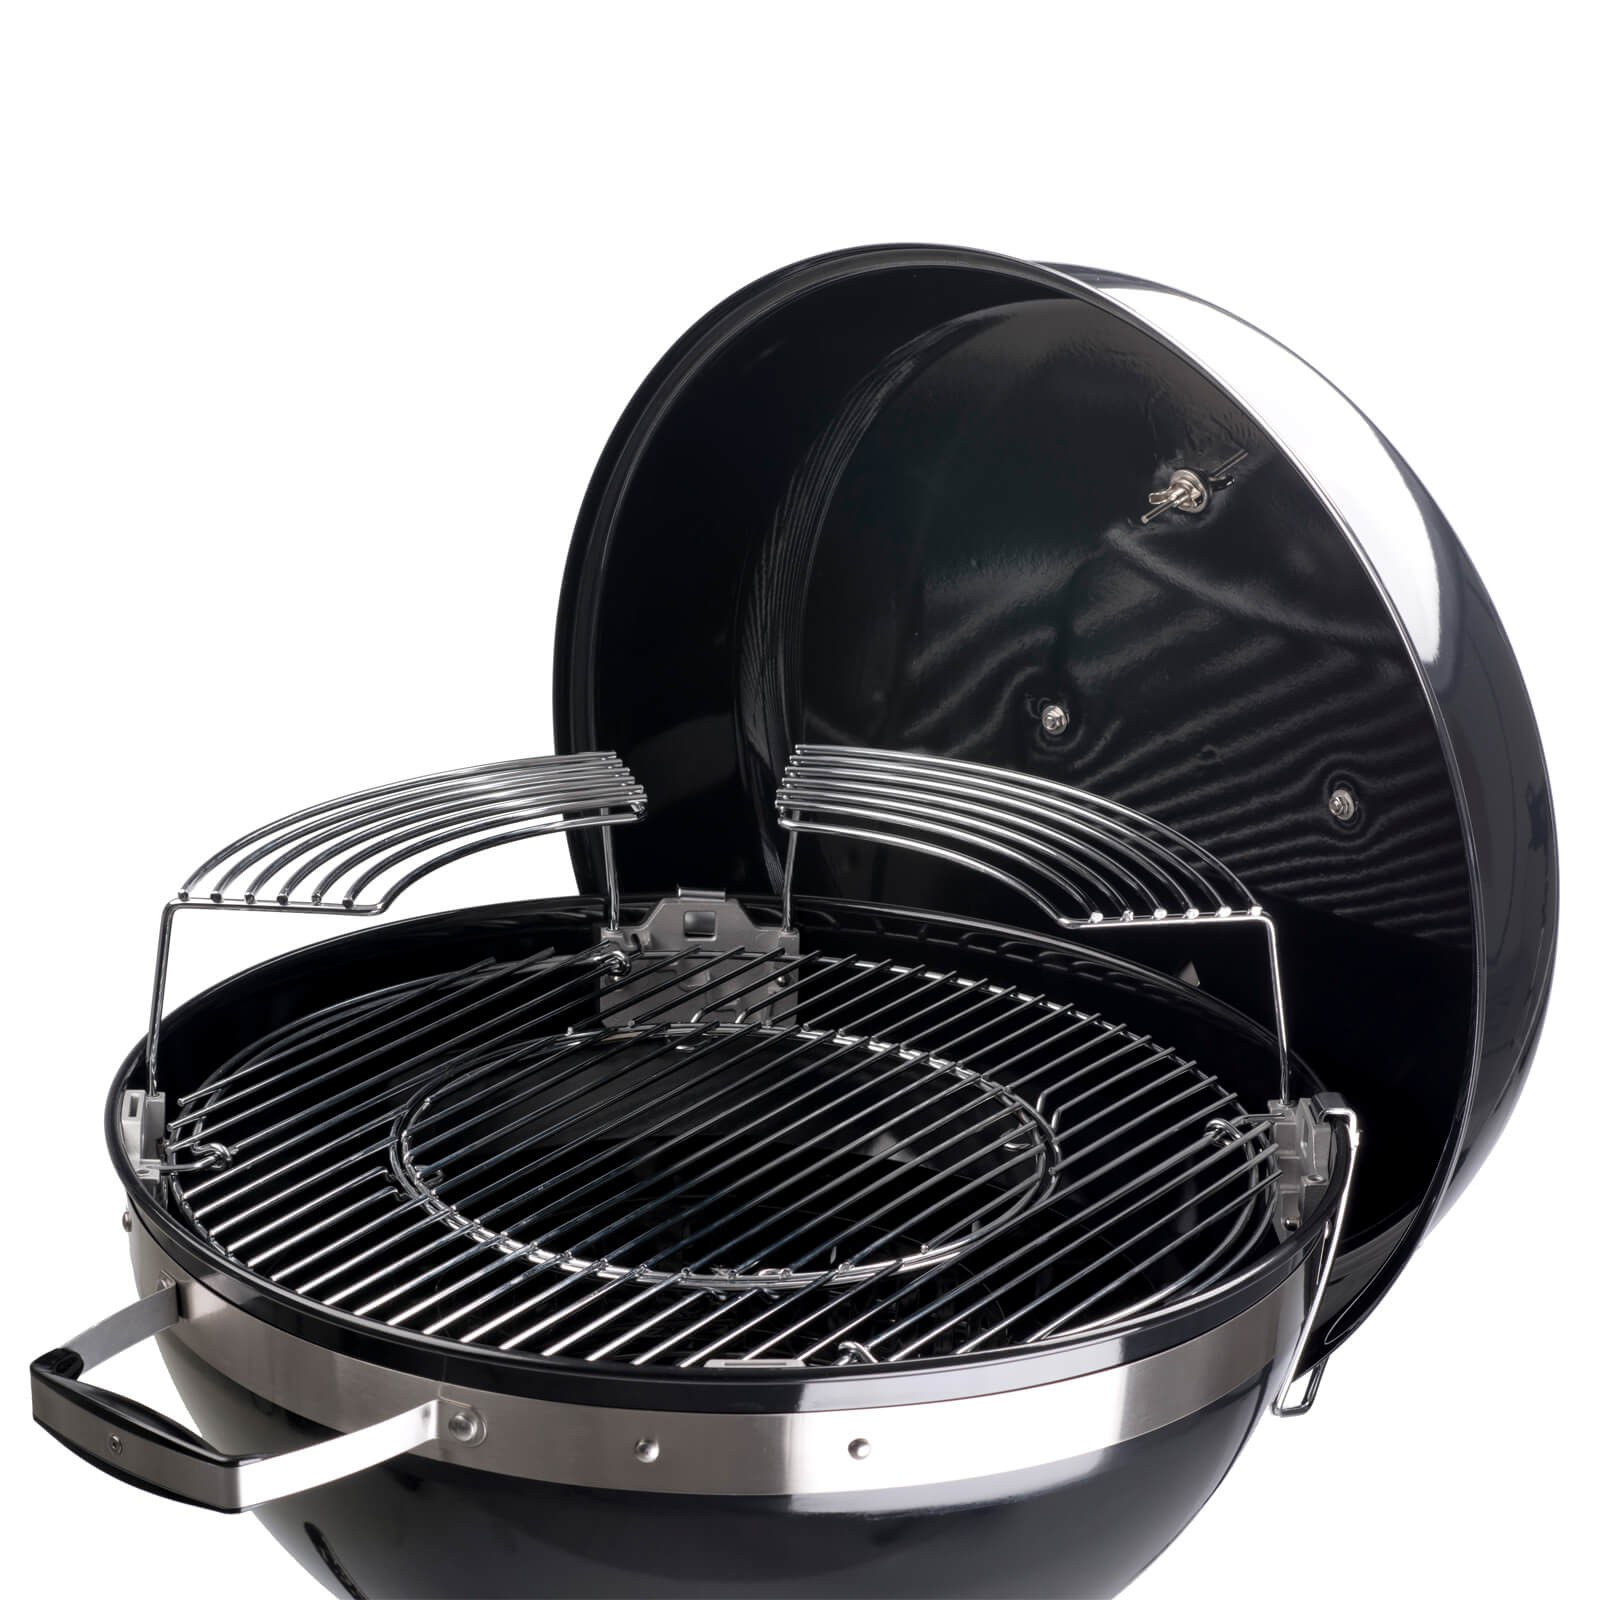 tepro warmhalterost 2er set passend f r grill sacramento san francisco 57 cm ebay. Black Bedroom Furniture Sets. Home Design Ideas